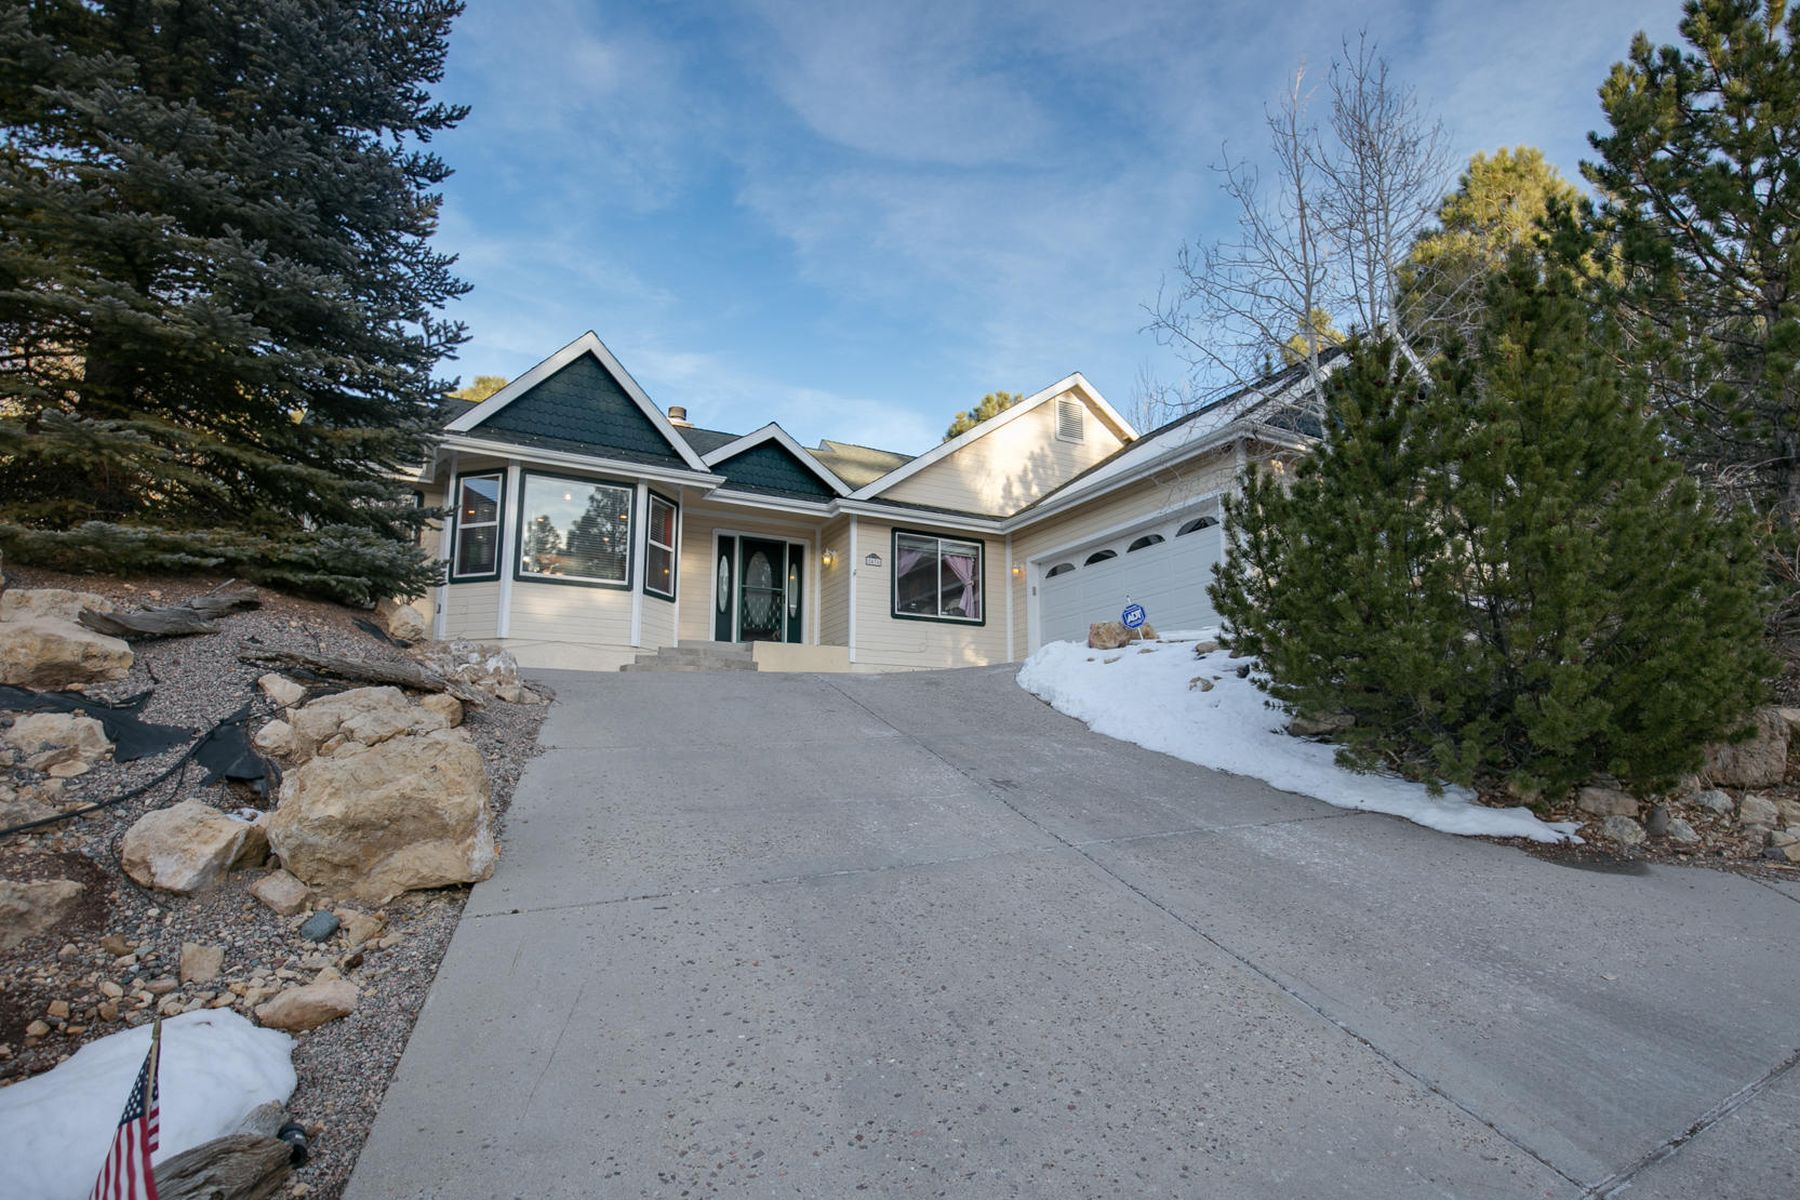 独户住宅 为 销售 在 Beautiful Home in Walnut Ridge Estates 2476 N Keystone DR, 弗拉格斯塔夫, 亚利桑那州, 86004 美国